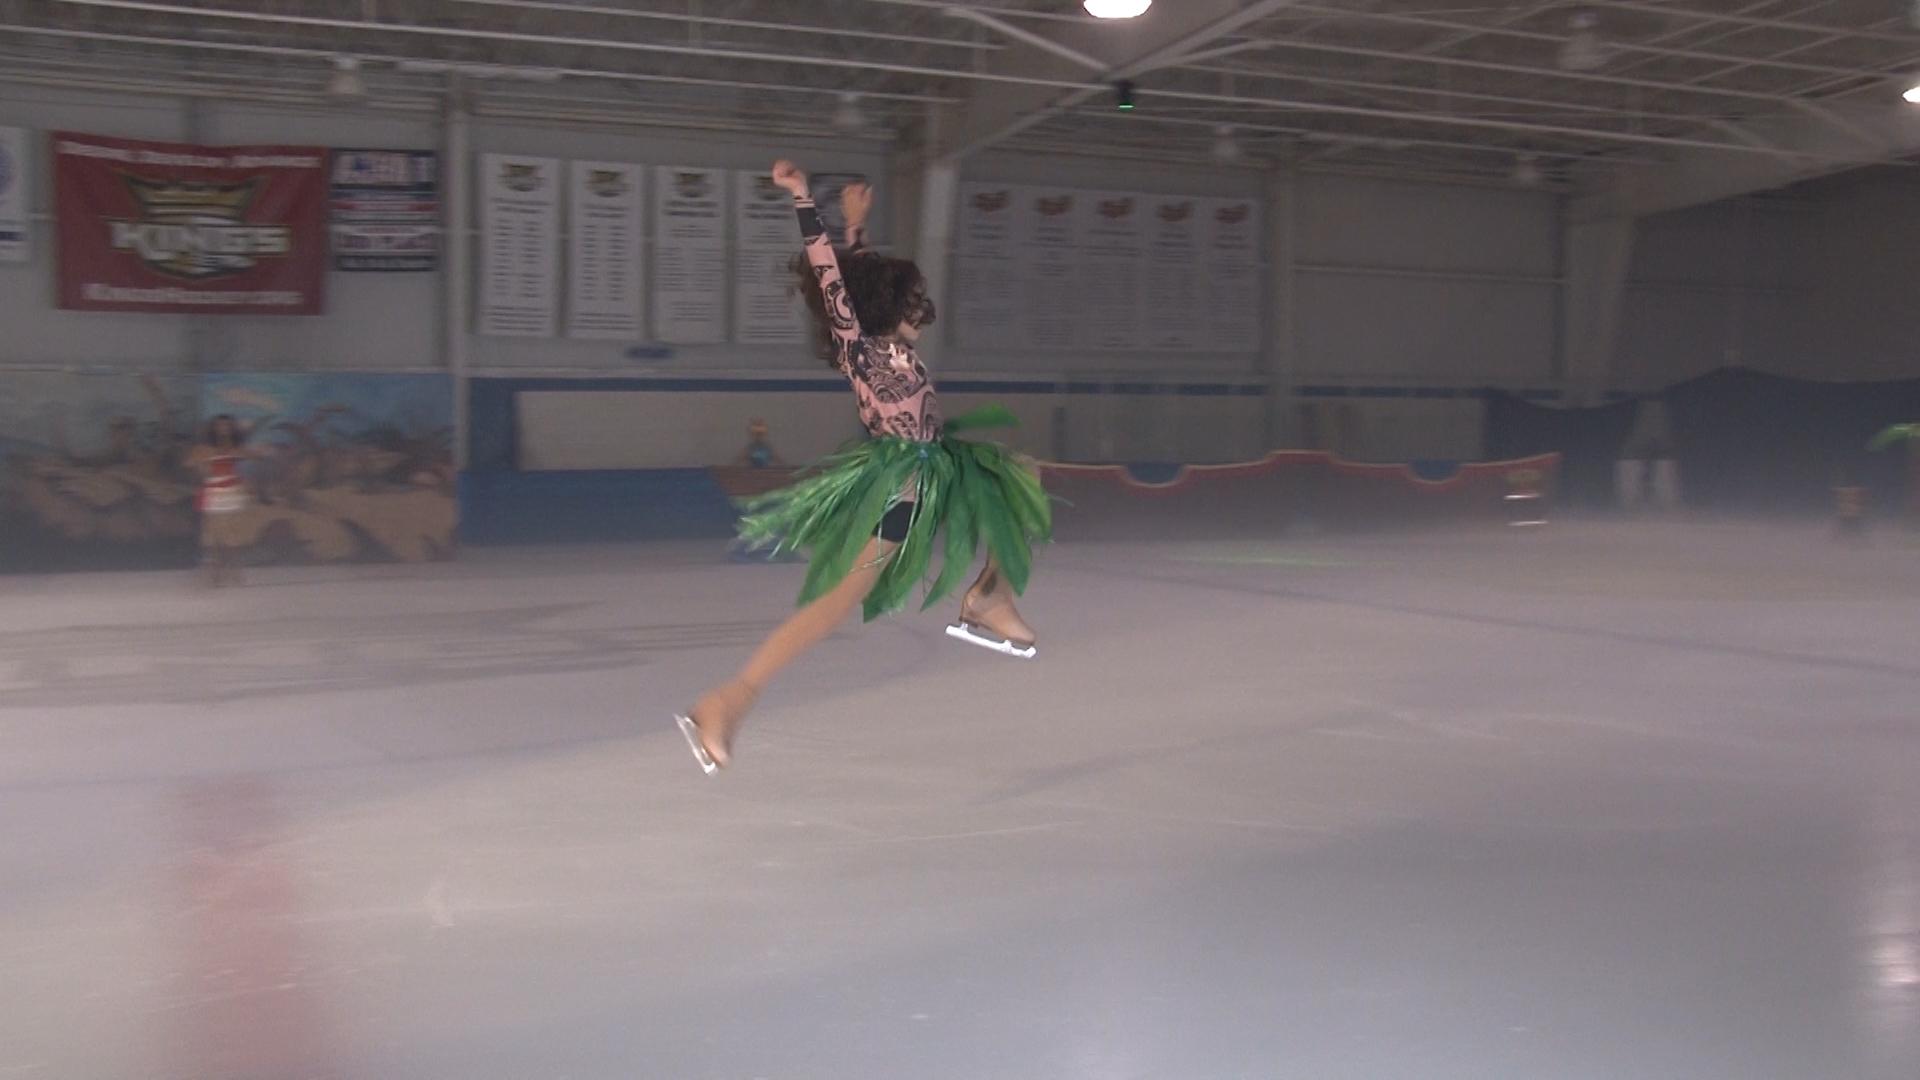 Power Play Maui Skate on Ice 071417.00_31_47_15.Still048.jpg